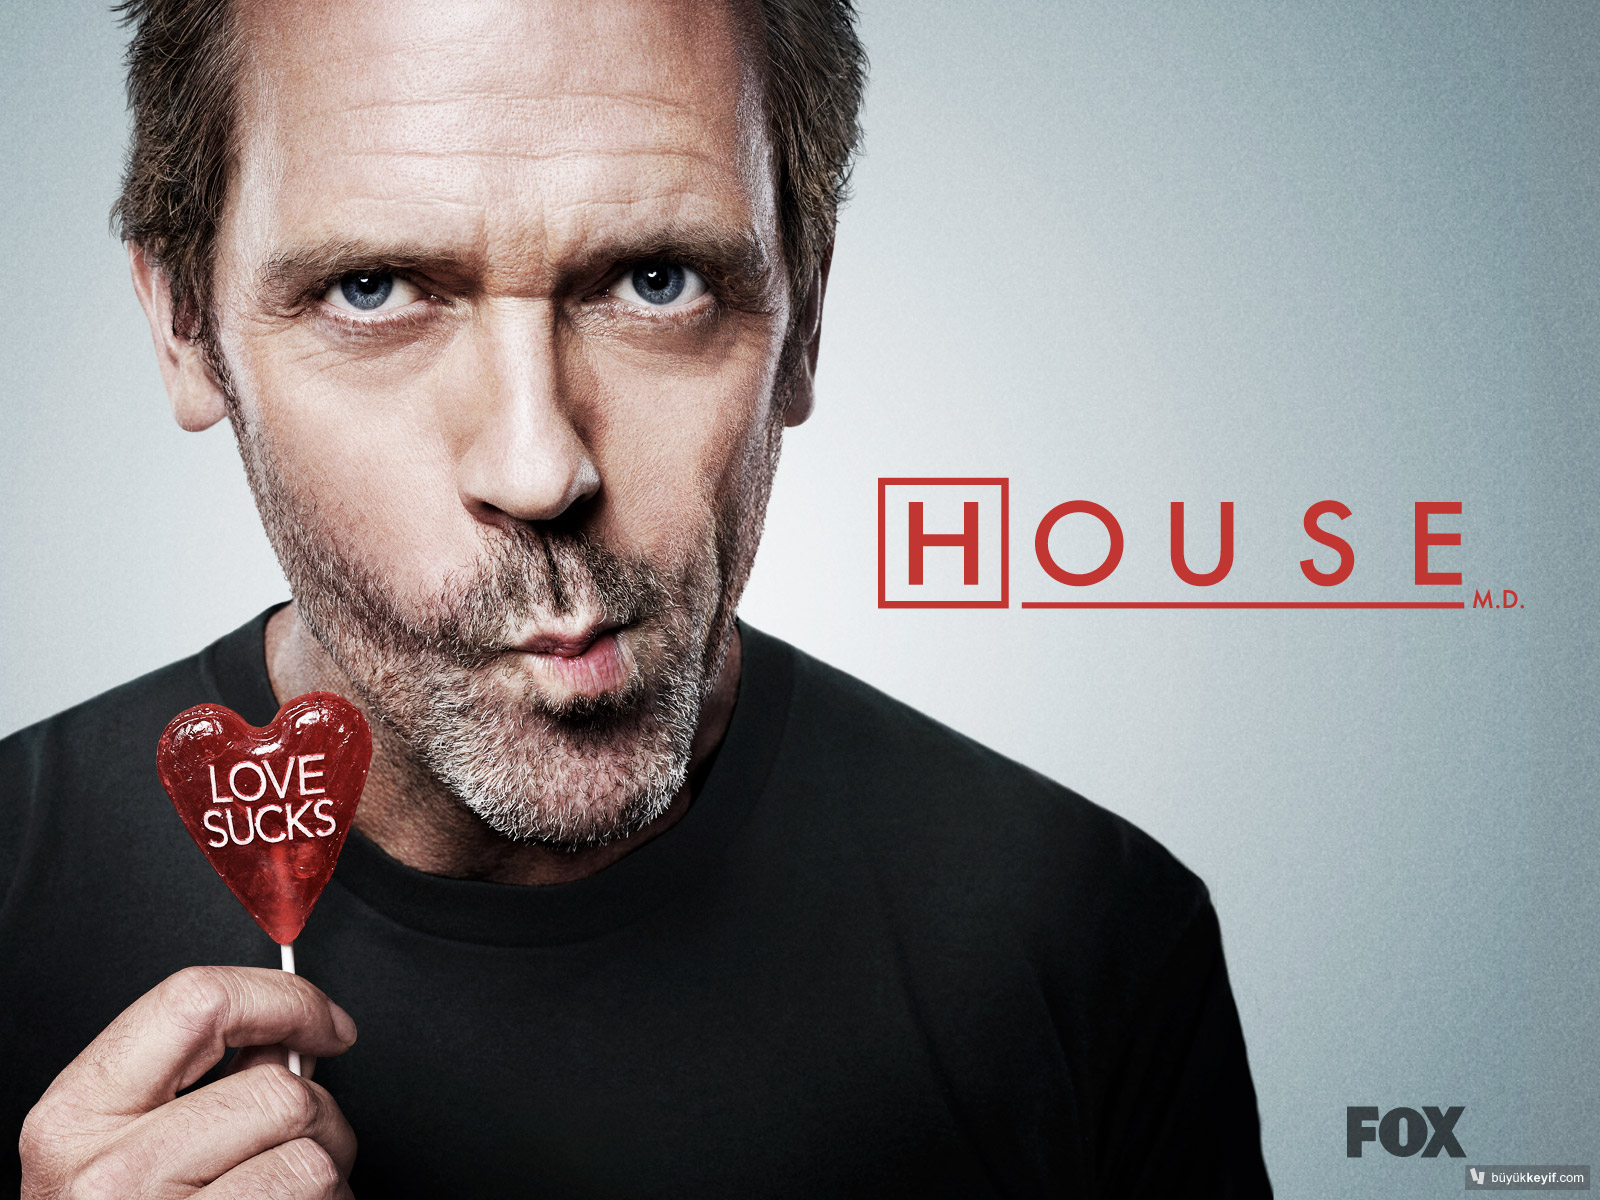 dr-house-love-sucks